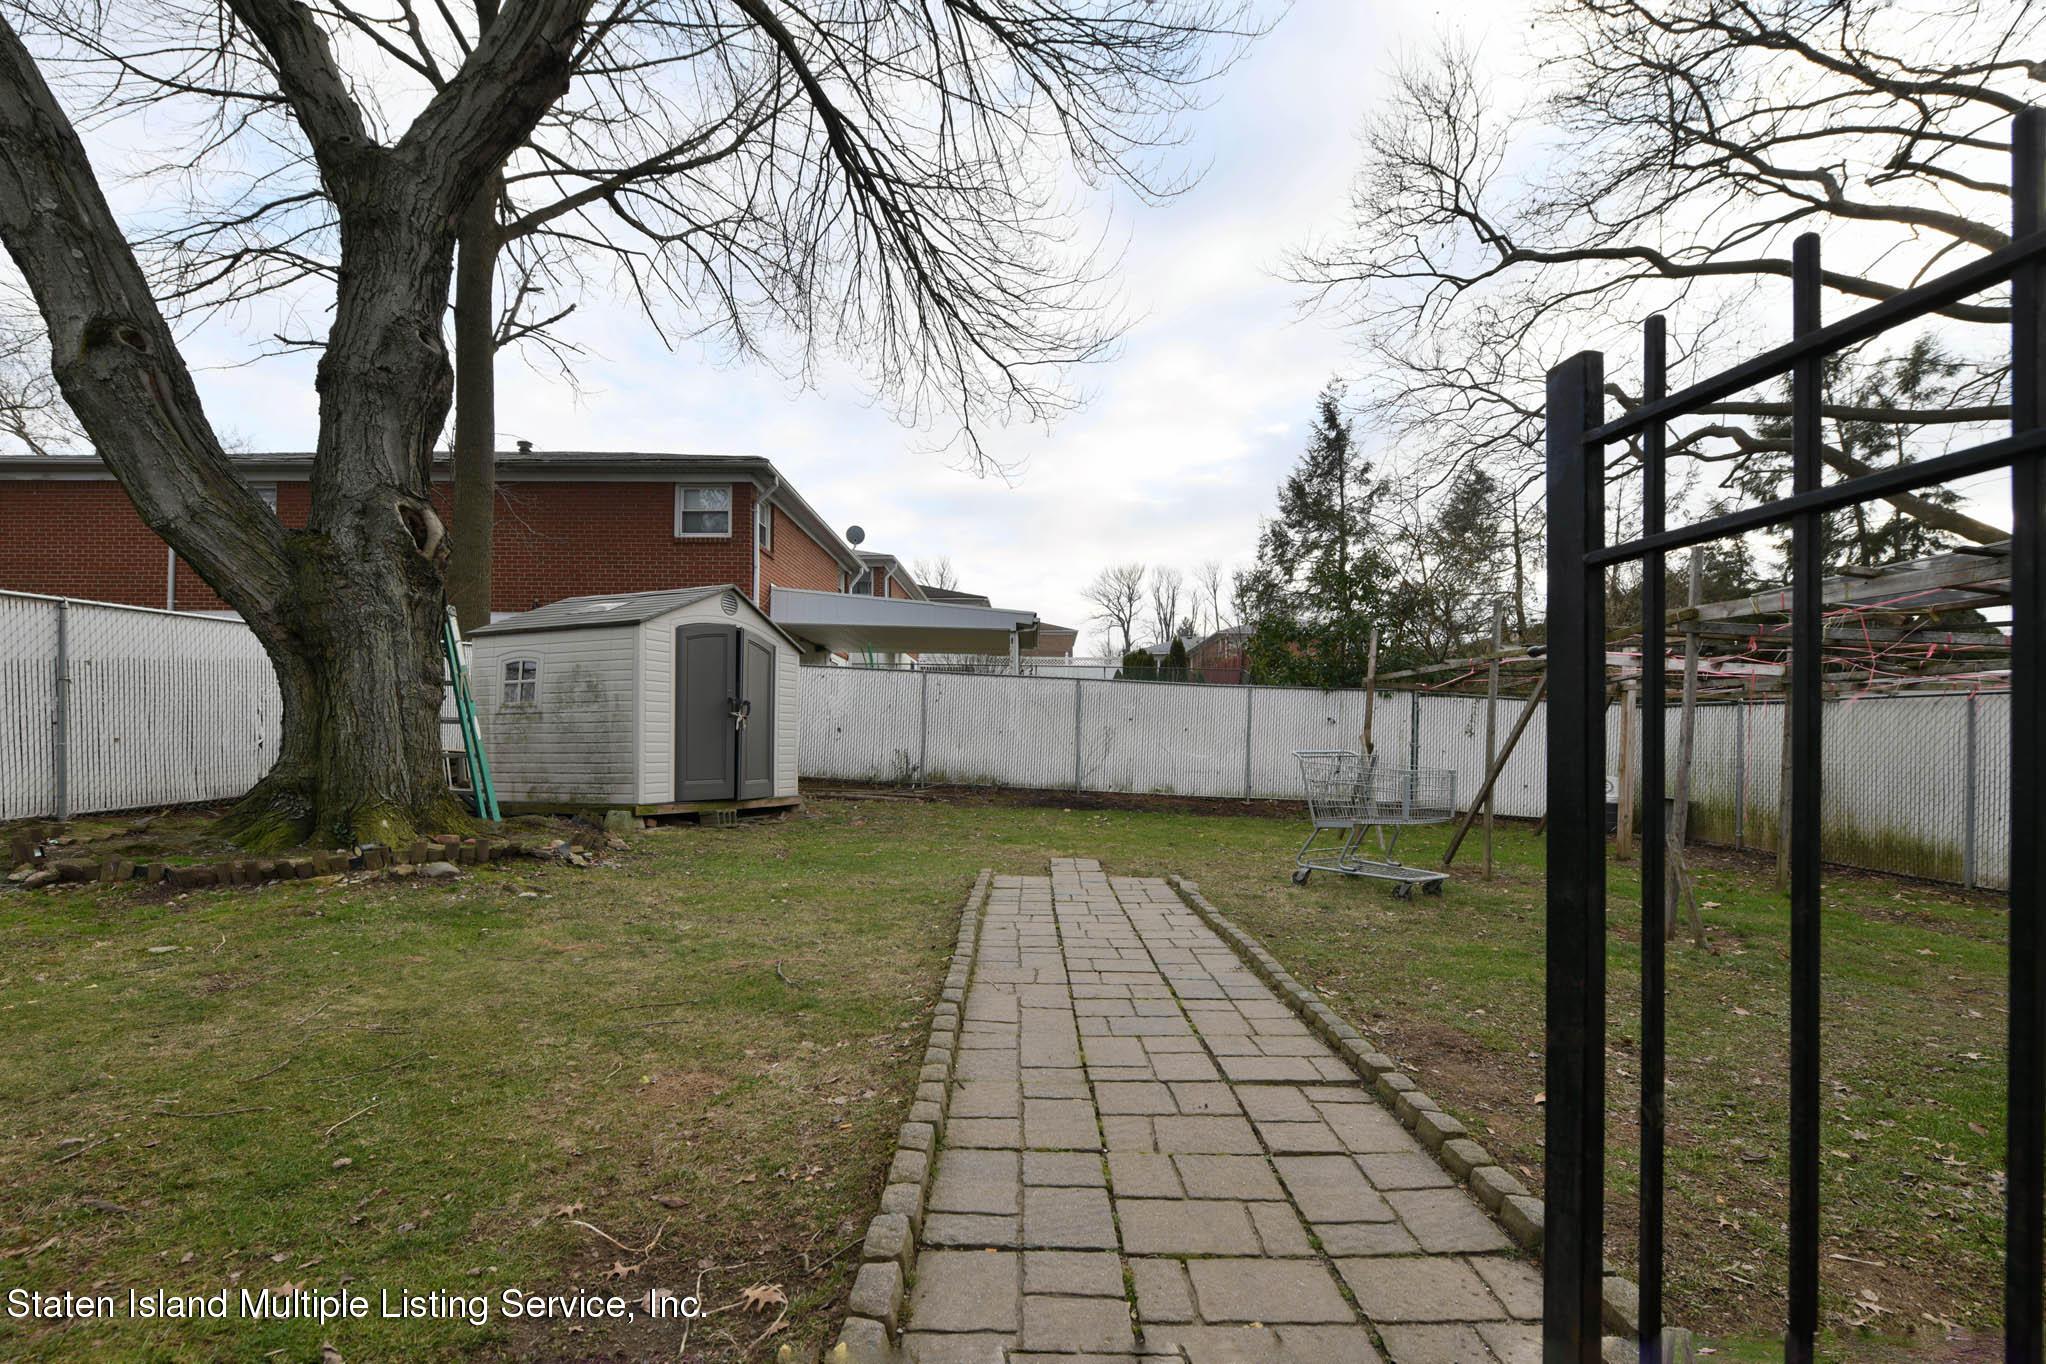 Single Family - Detached 110 Ravenhurst Avenue  Staten Island, NY 10310, MLS-1143189-16